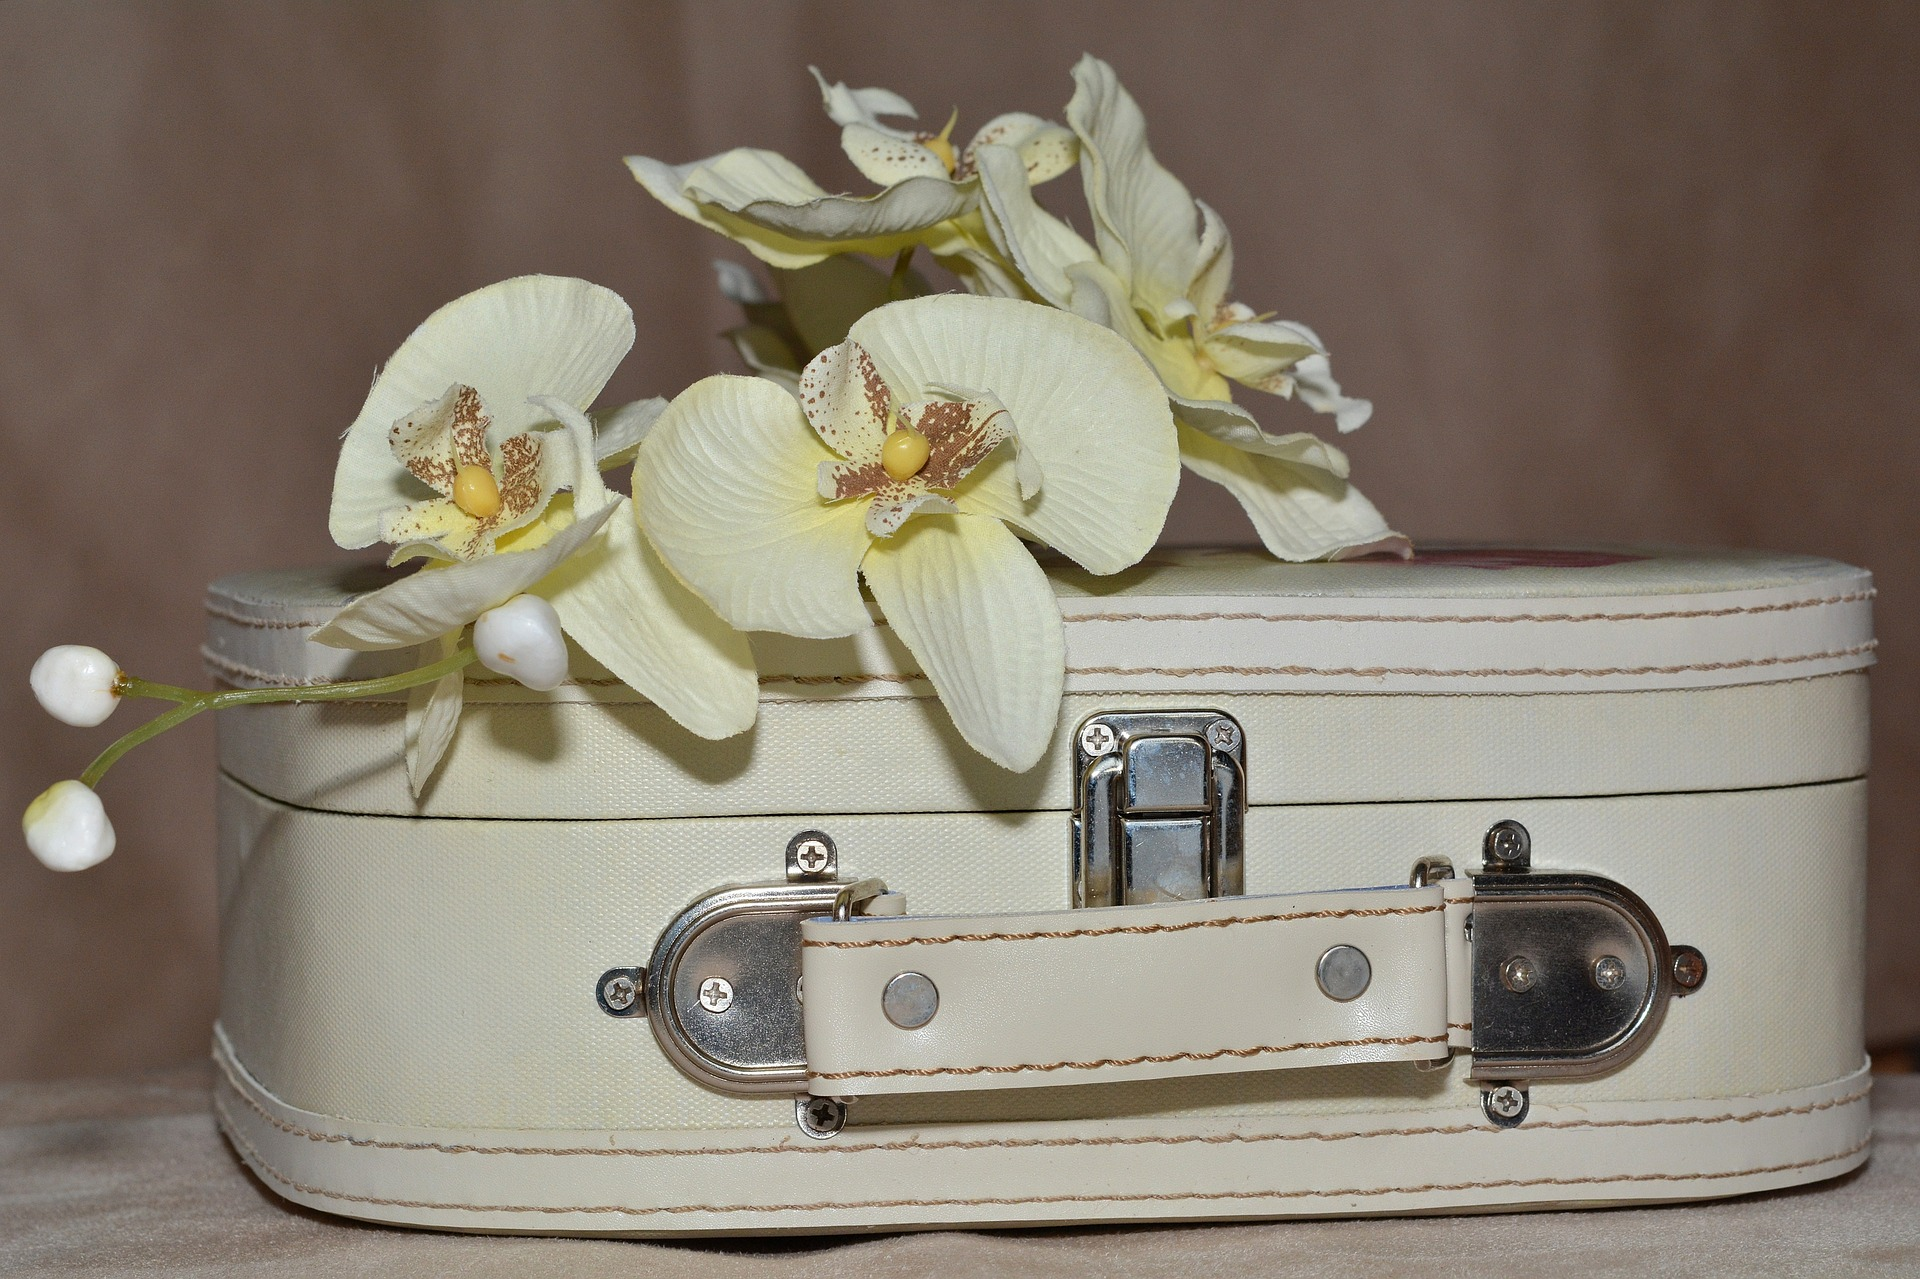 luggage-606542_1920.jpg